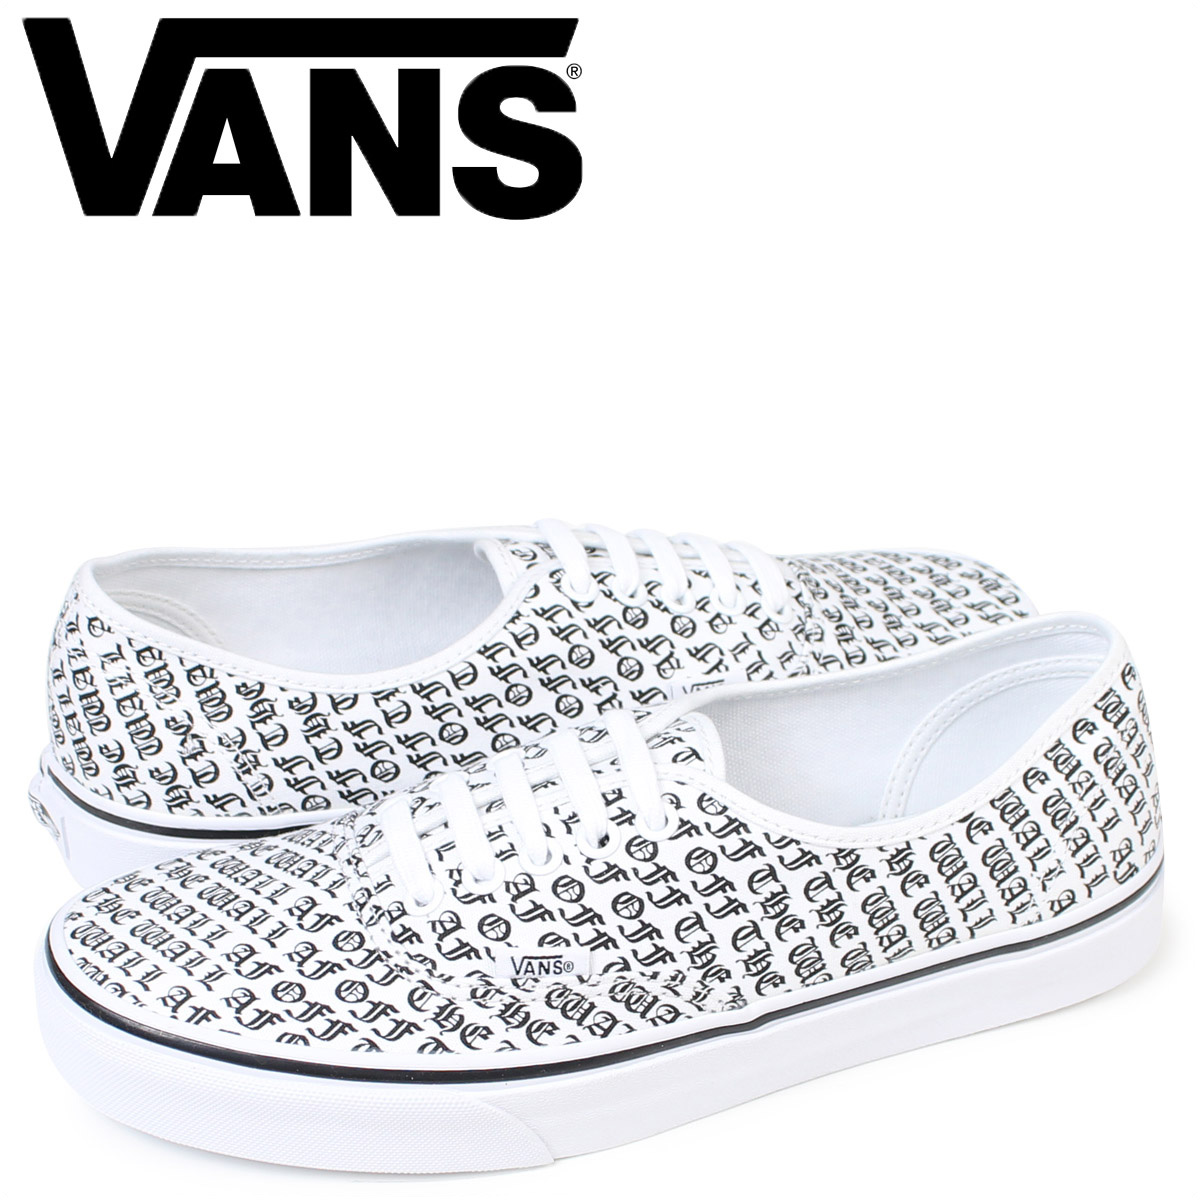 eee7f171a3 Sugar Online Shop  VANS authentic sneakers men vans station wagons ...